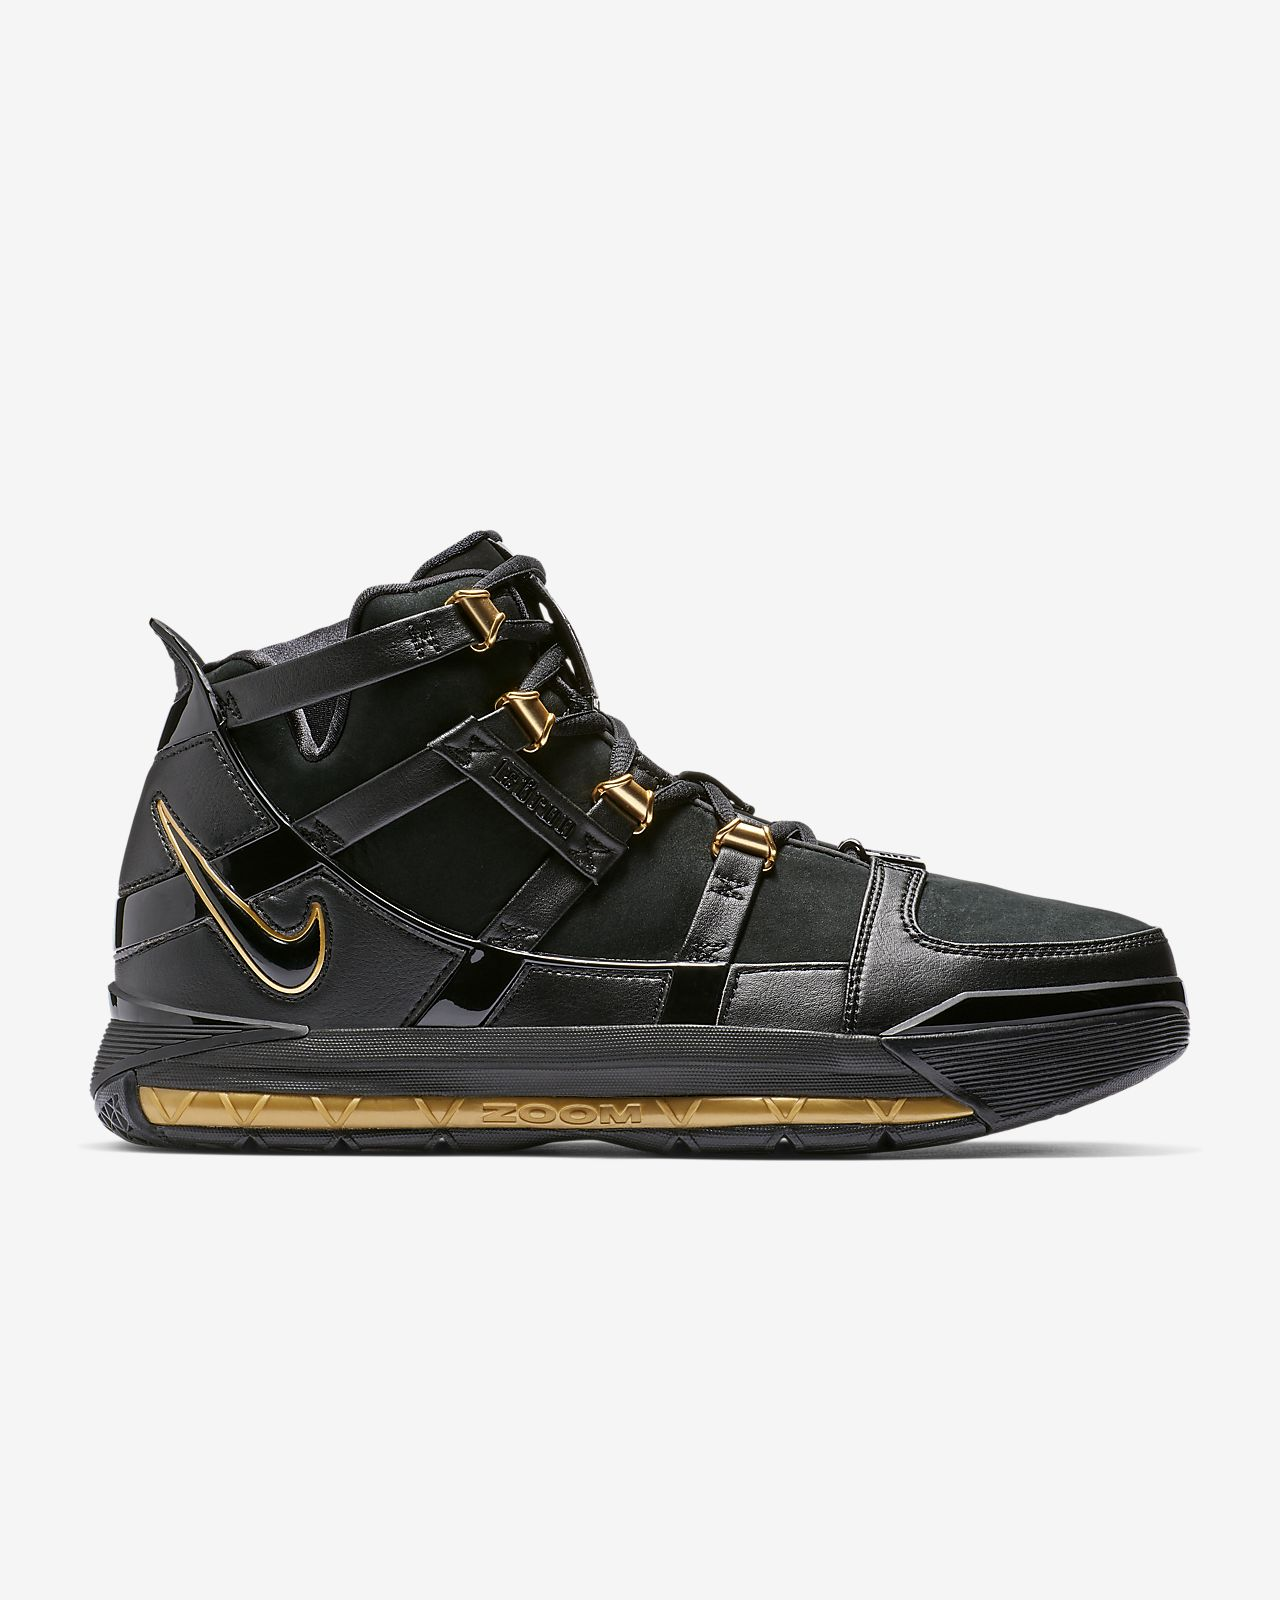 169e721bbc74c Zoom LeBron 3 QS Men s Shoe. Nike.com IN